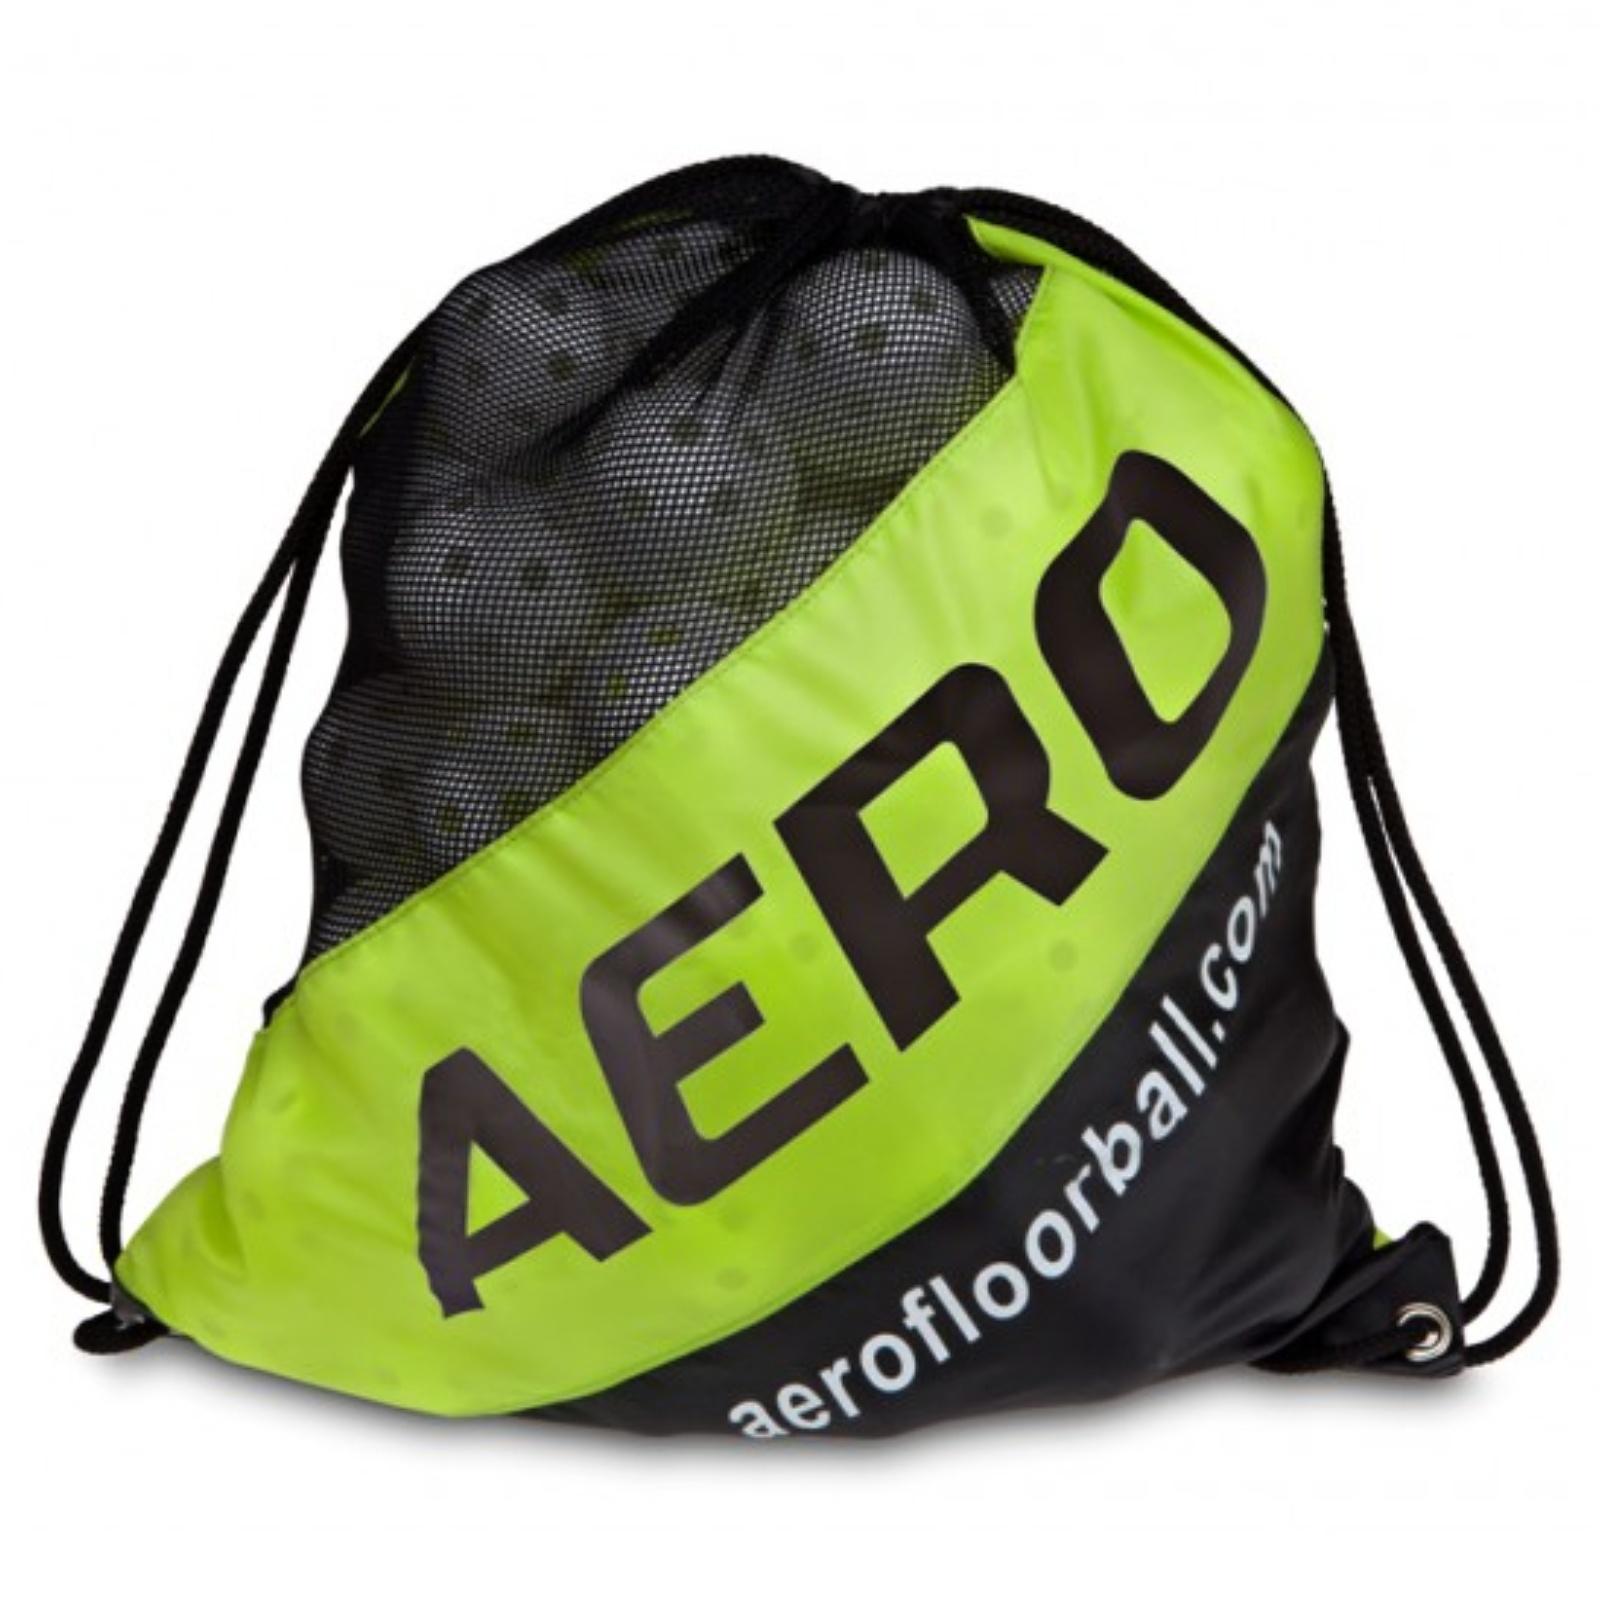 Florbalový vak SALMING Aero Ballsack